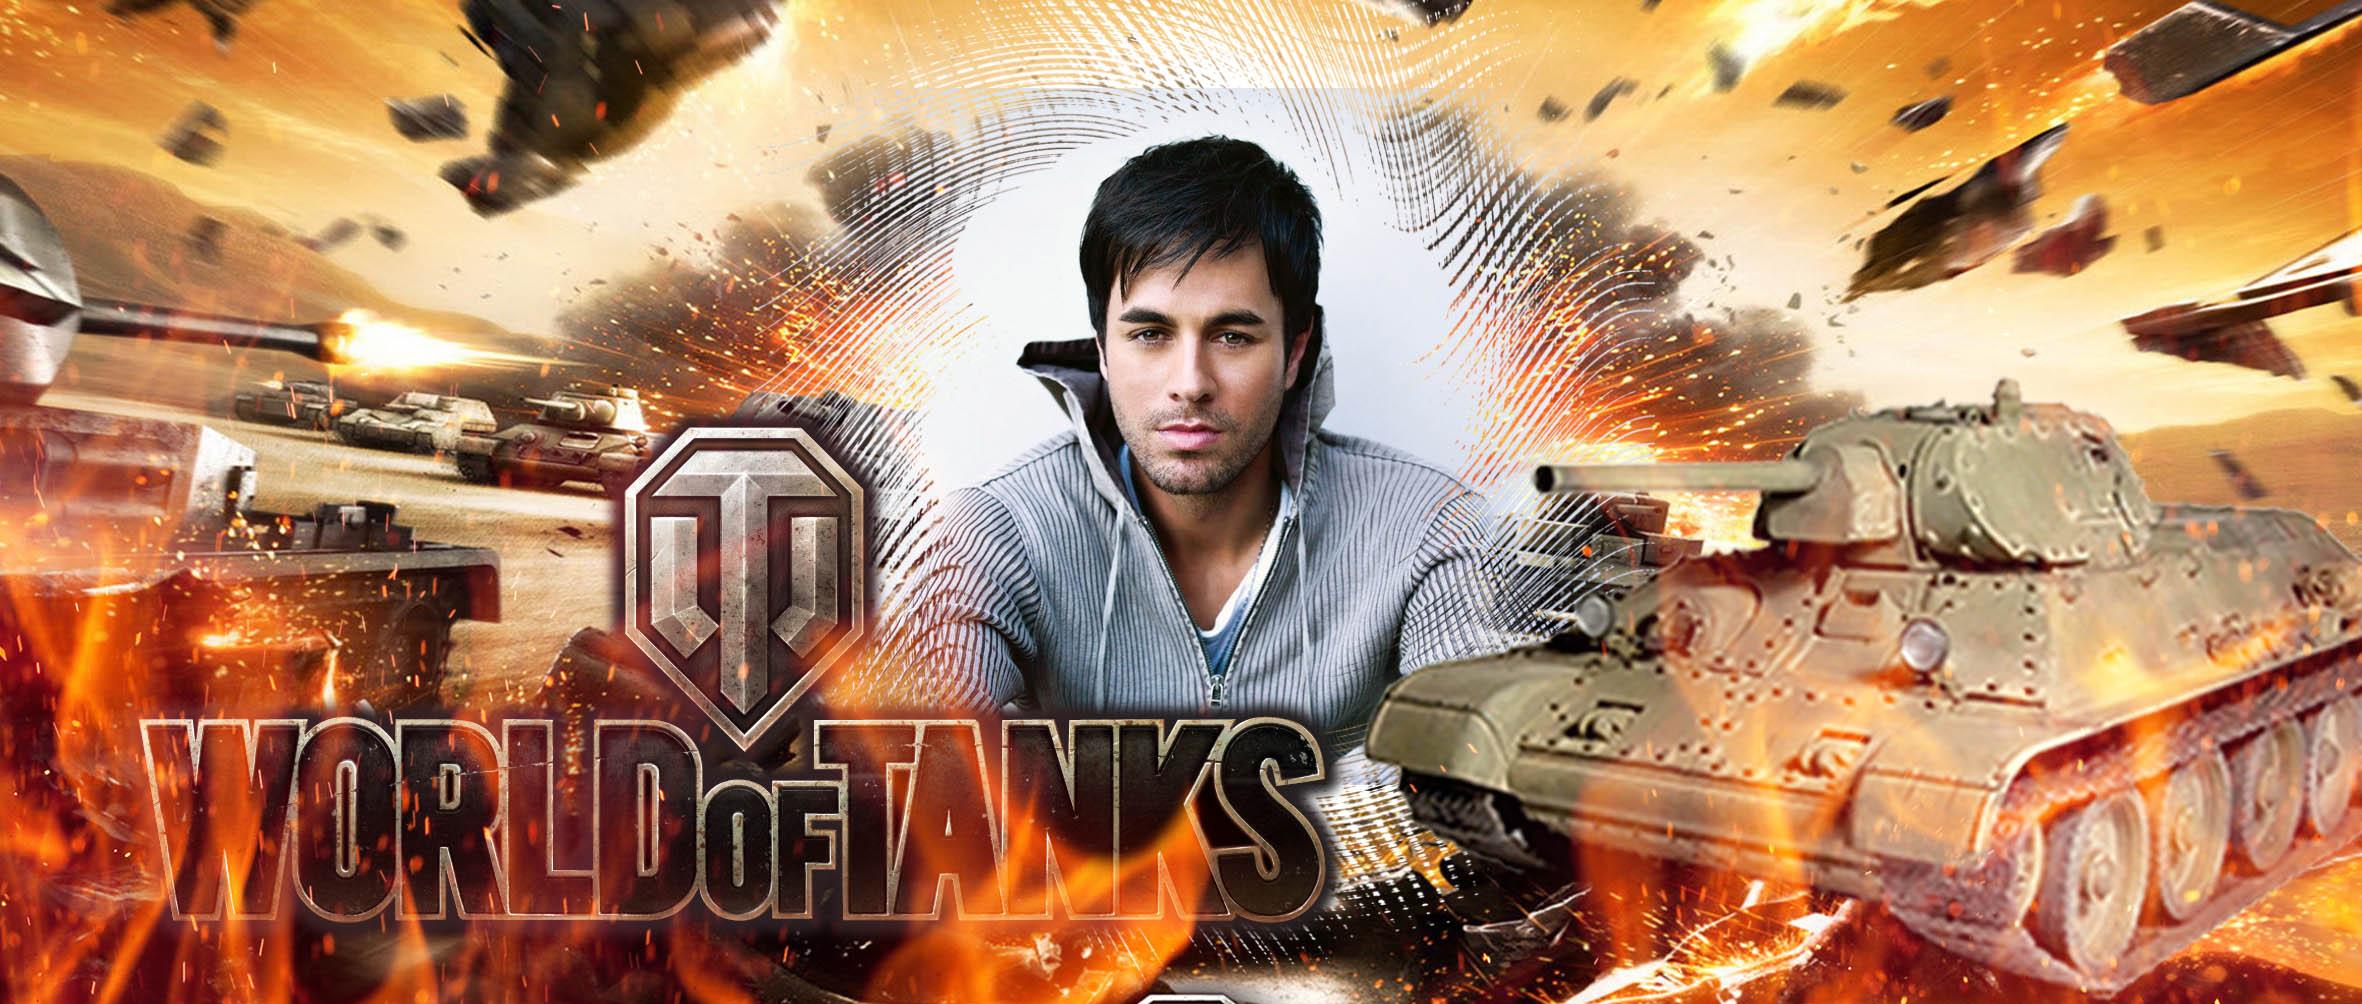 Правила премиум магазина World of Tanks World of 4